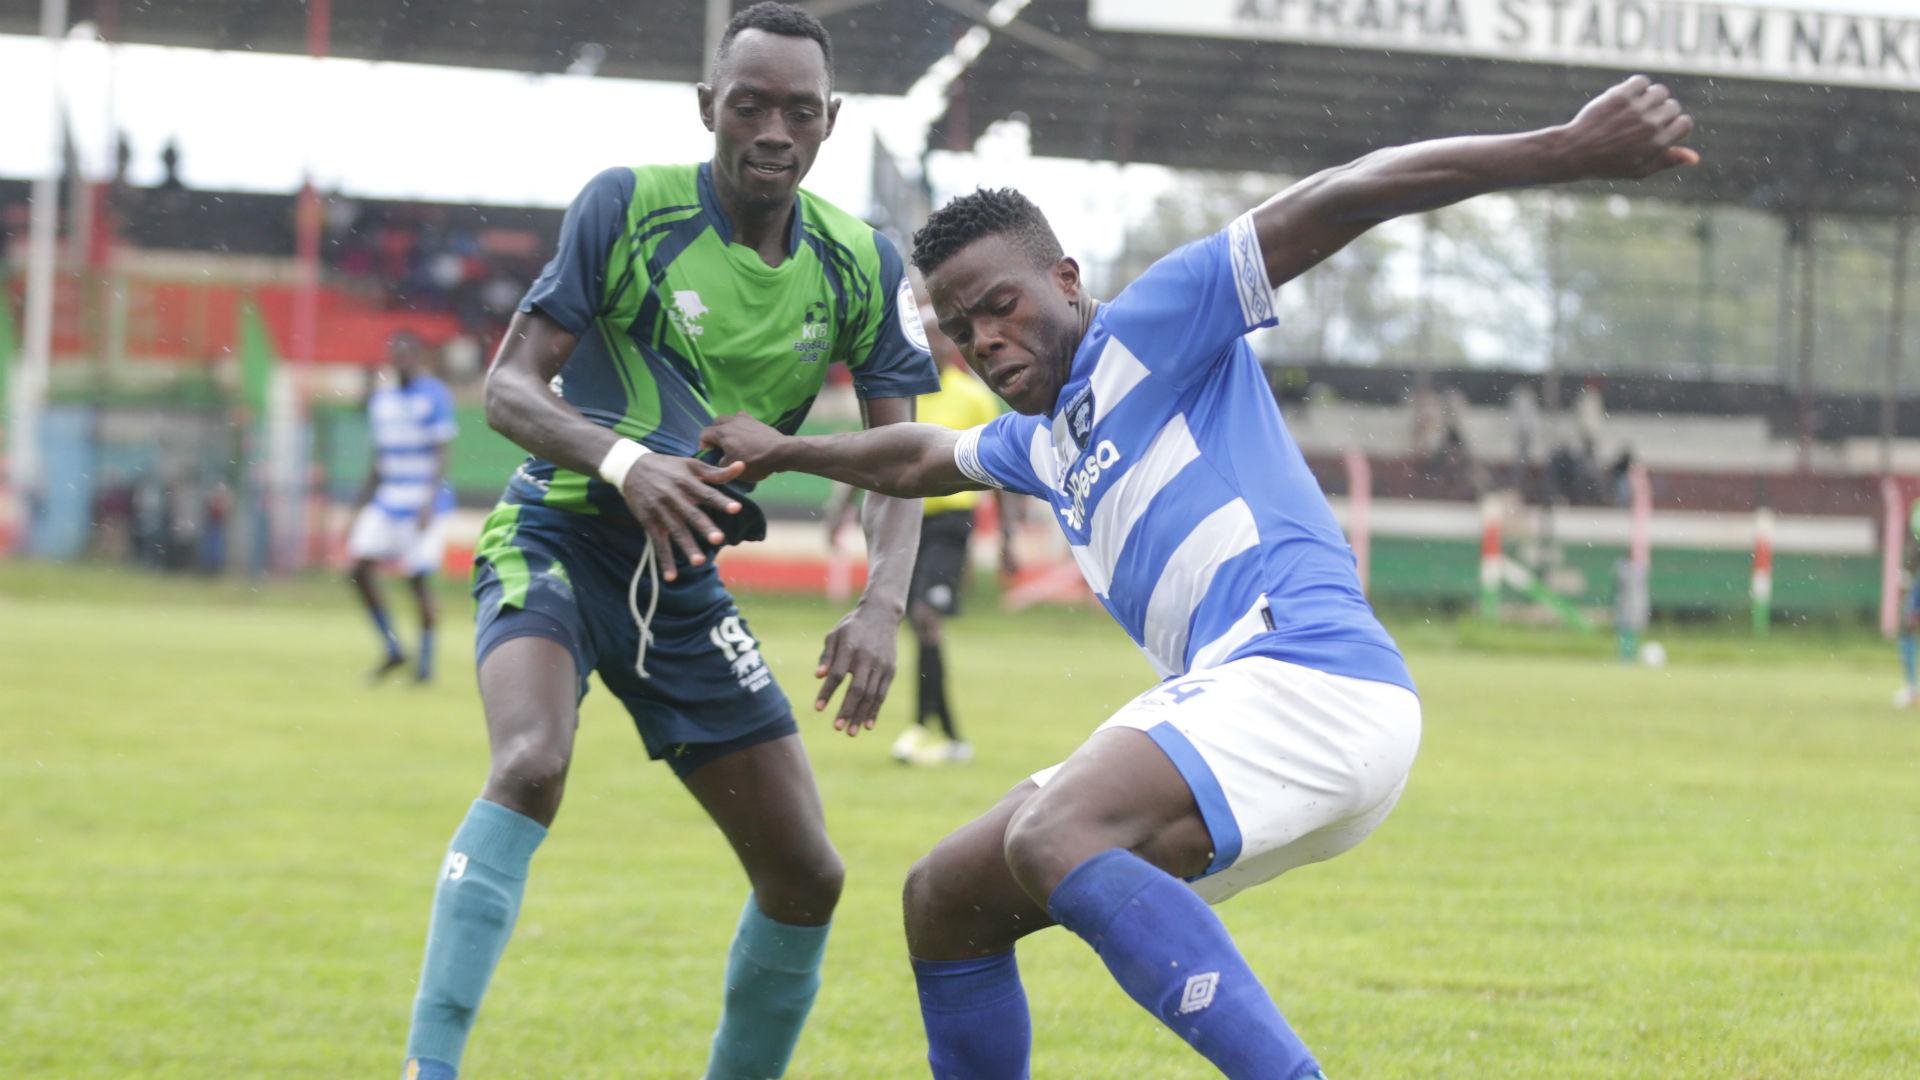 Forward Oburu and AFC Leopards part ways